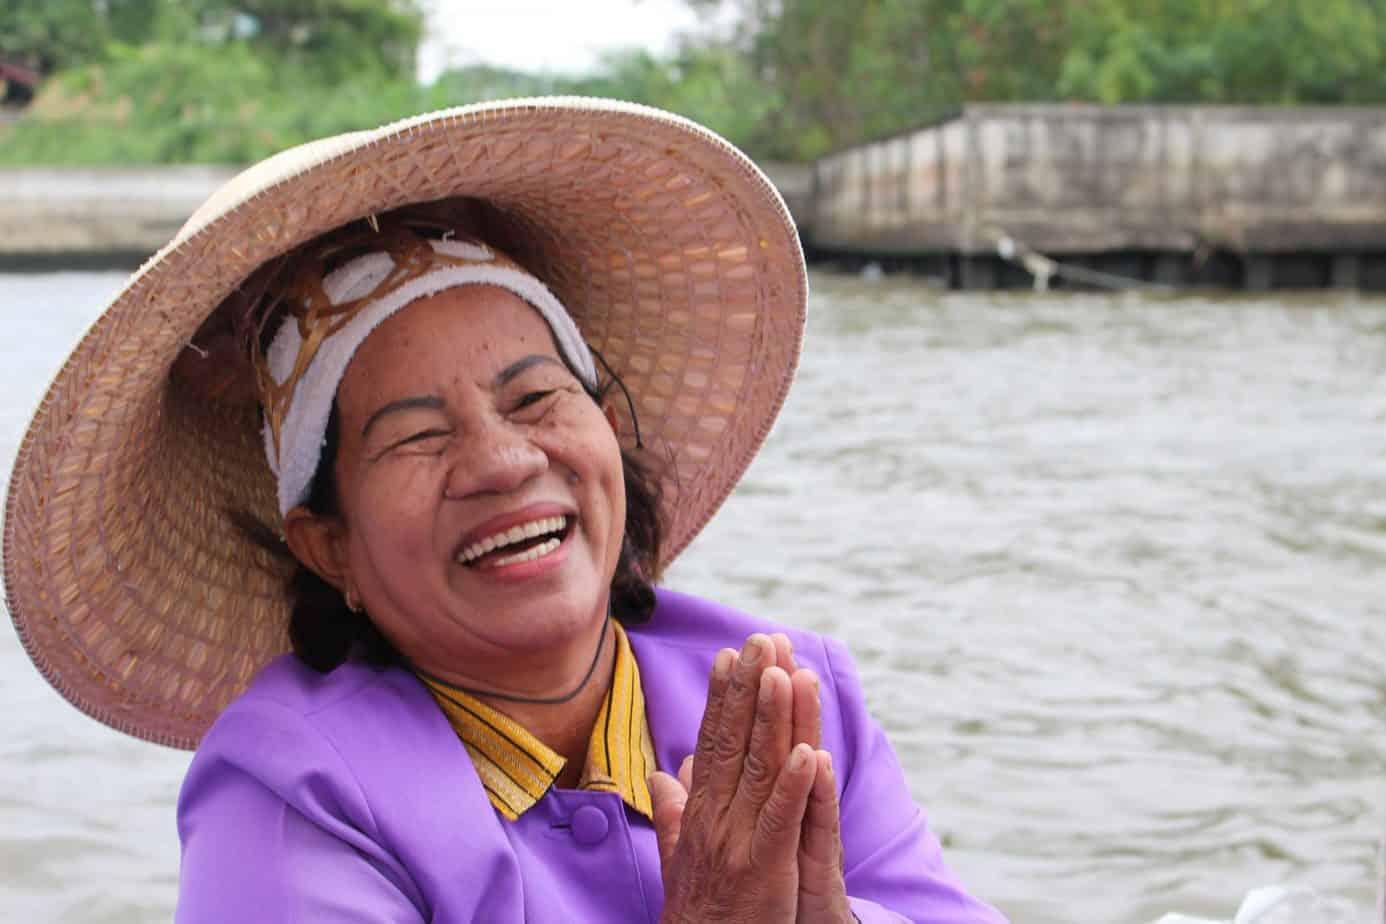 Thai lady in Bangkok, Thailand